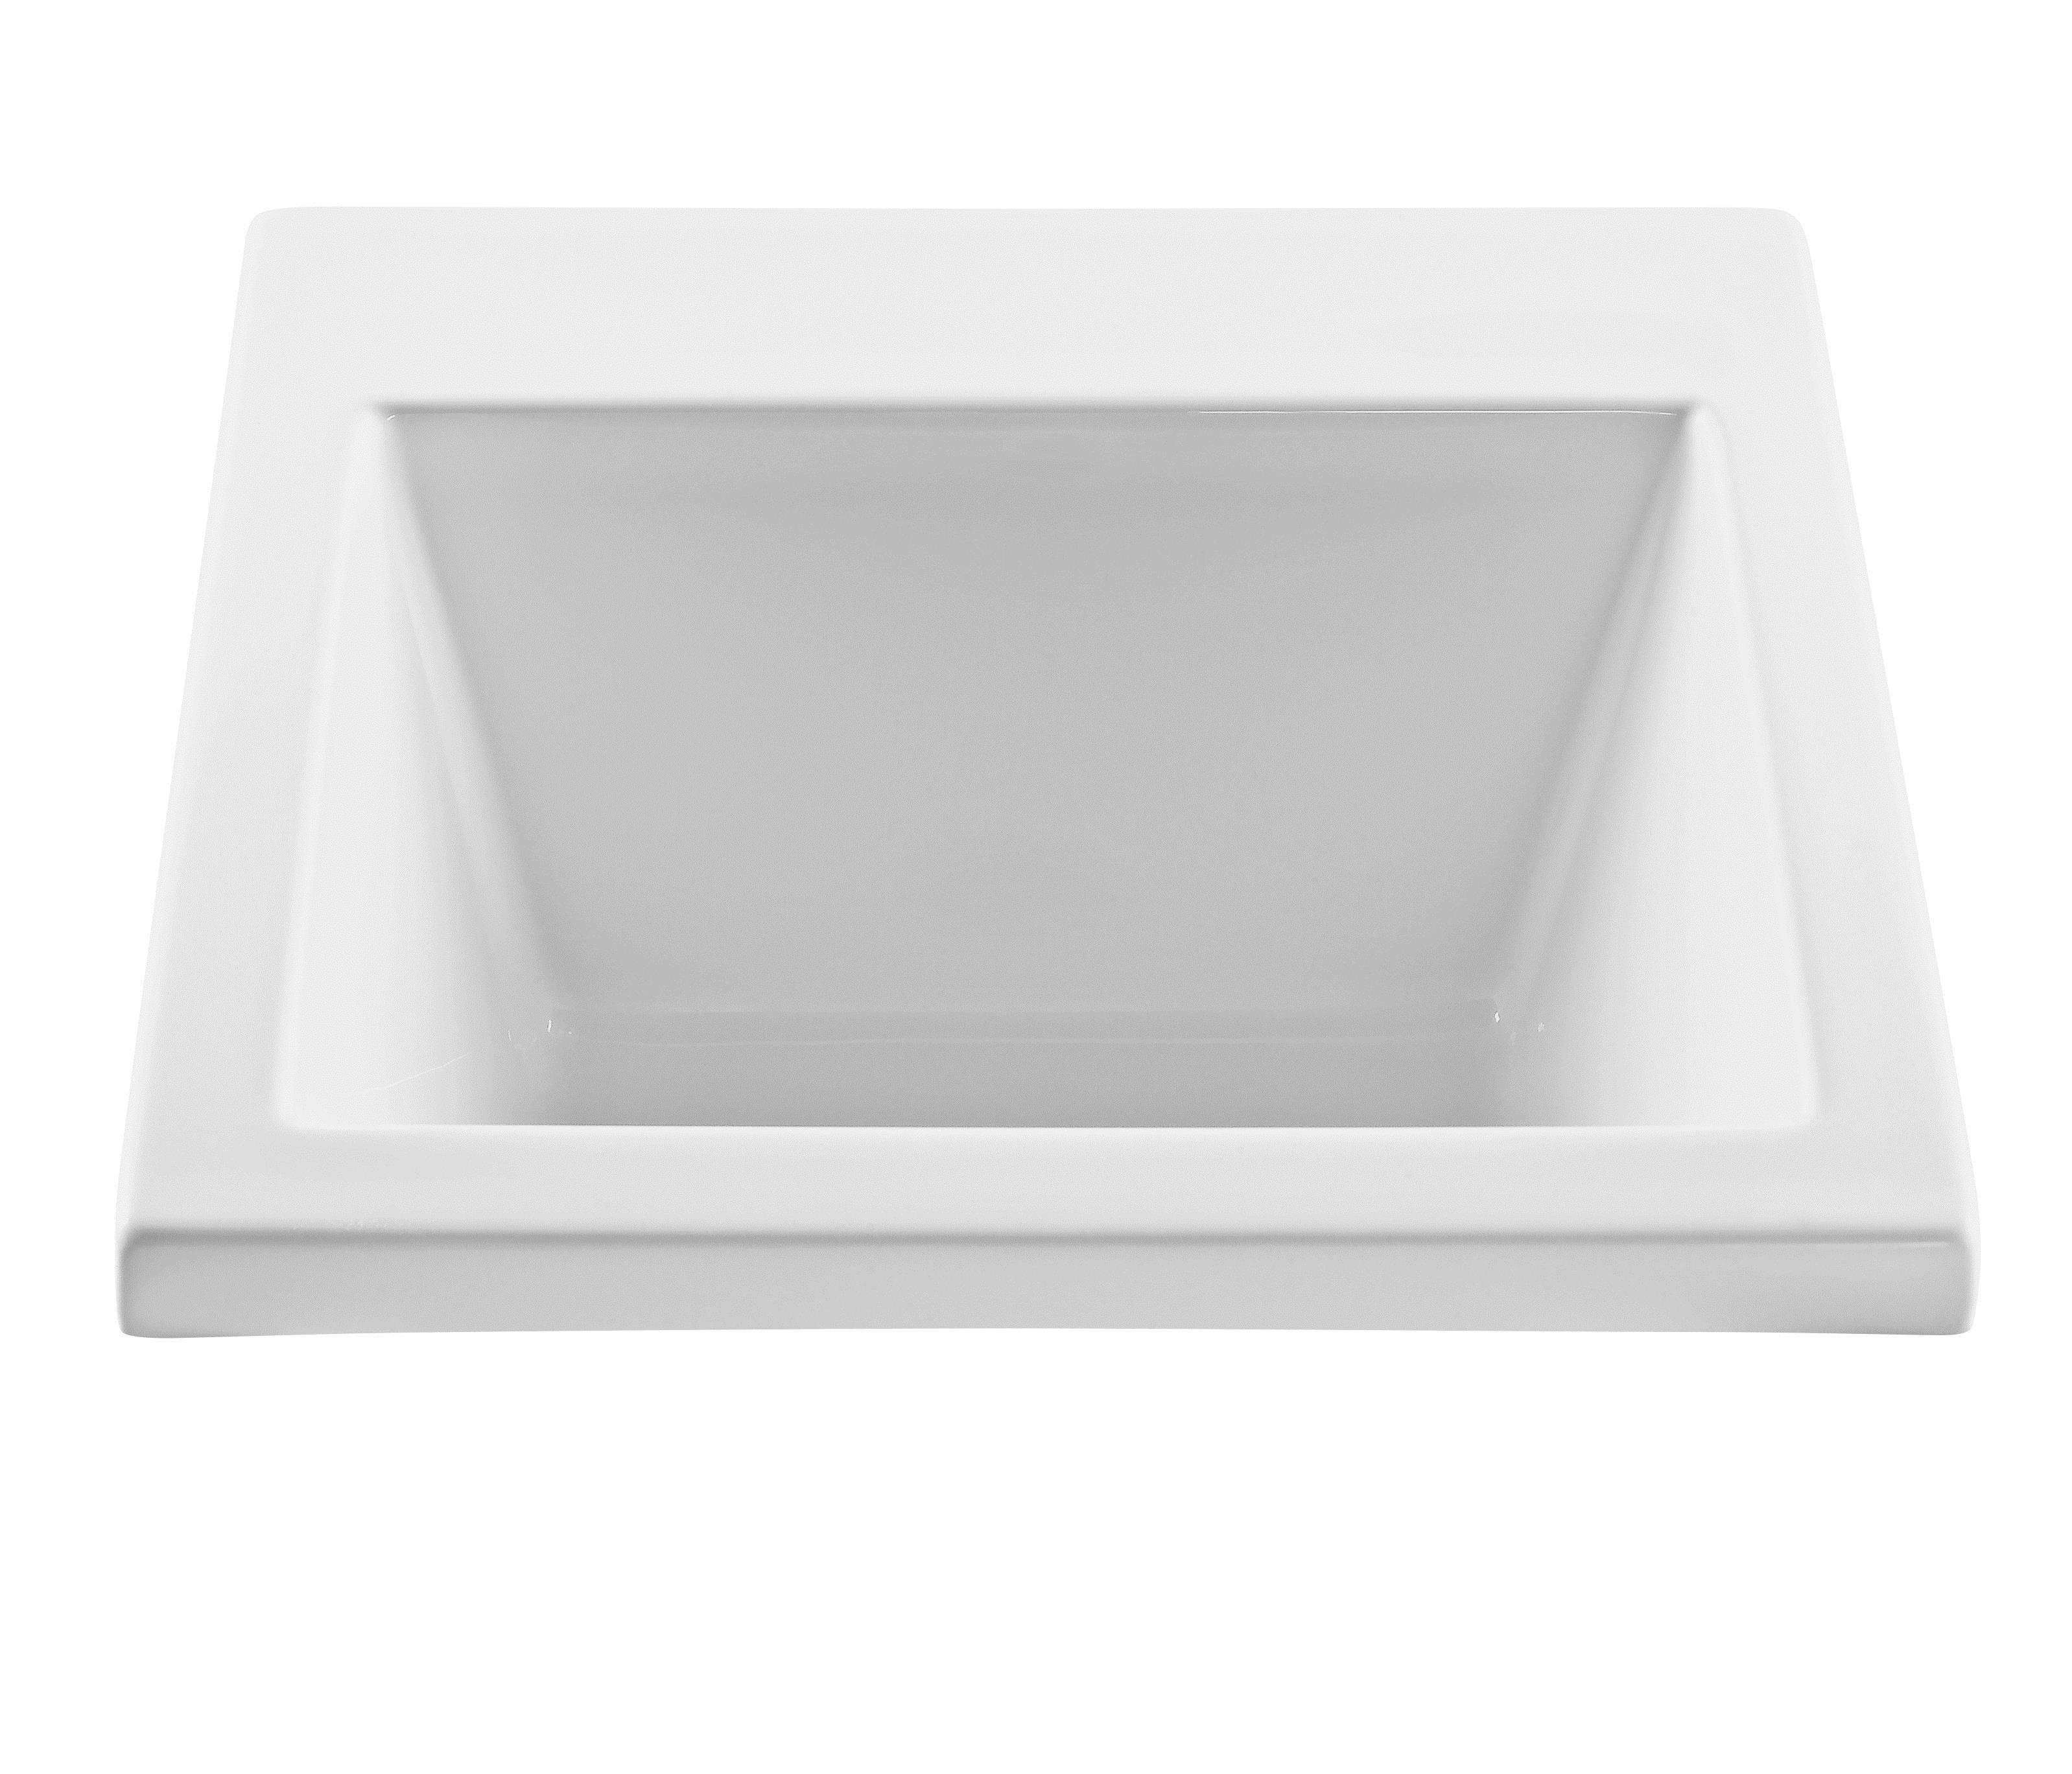 RLS120GRP1 Versatile Acrylic Single Bowl Laundry Sink In Black